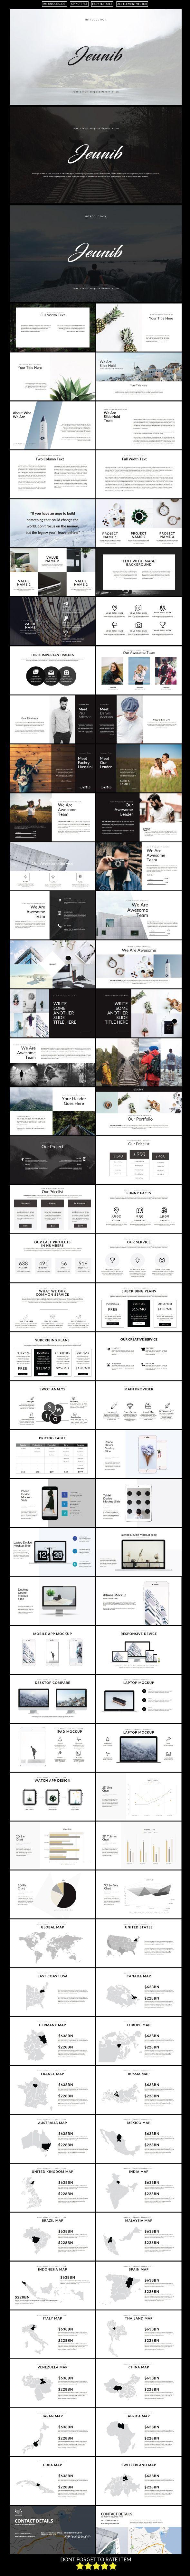 Jeunib Multipurpose Keynote Template — Keynote KEY #seo #advertisement • Download ➝ https://graphicriver.net/item/jeunib-multipurpose-keynote-template/18834131?ref=pxcr